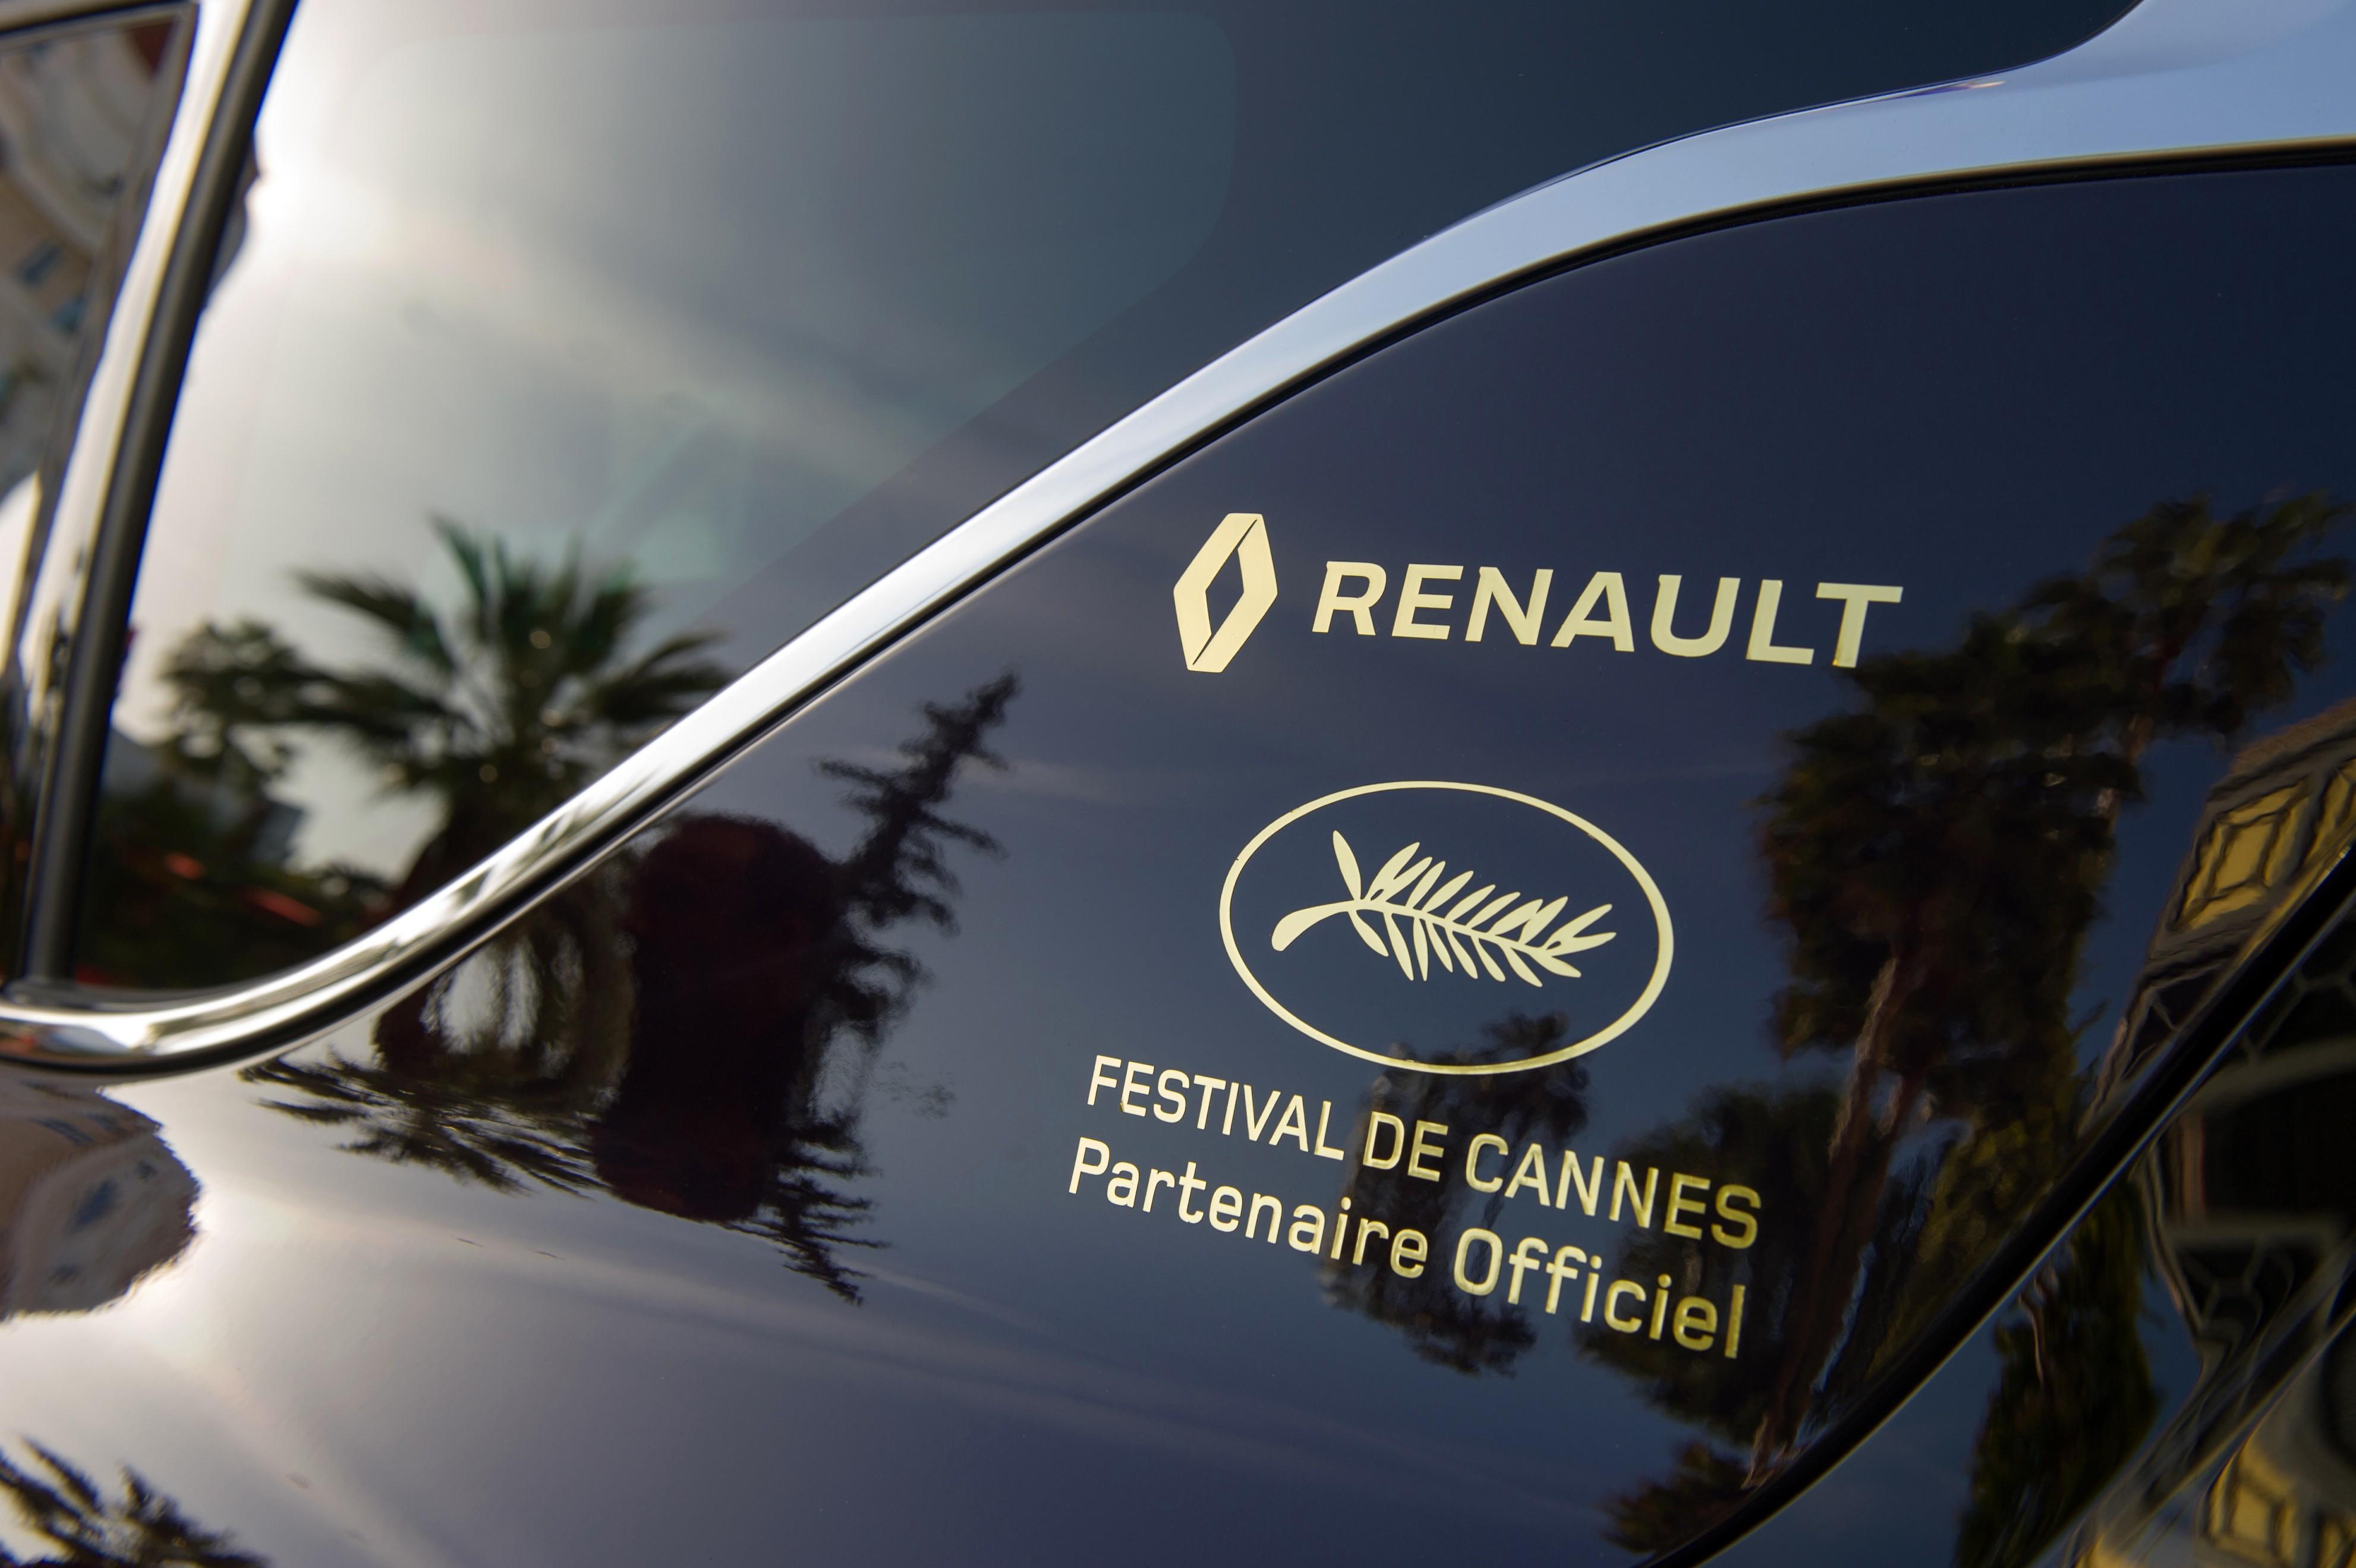 Renault si conferma partner del Festival di Cannes